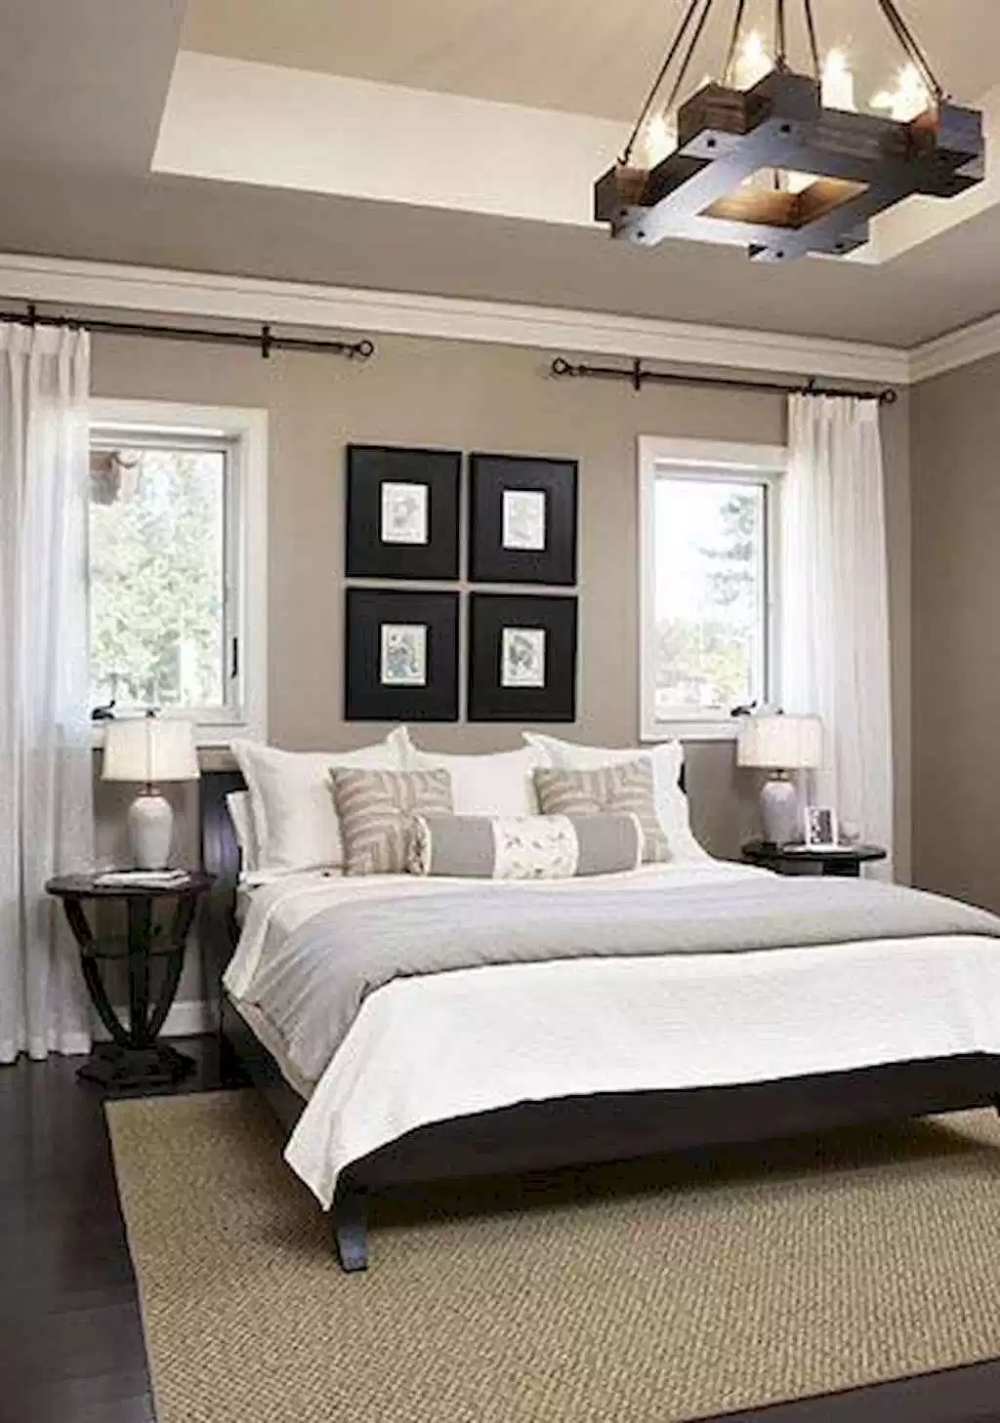 52 Simple Bedroom Decorating Ideas With Beautiful Color Bedroom Interior Small Master Bedroom Cozy Bedroom Furniture